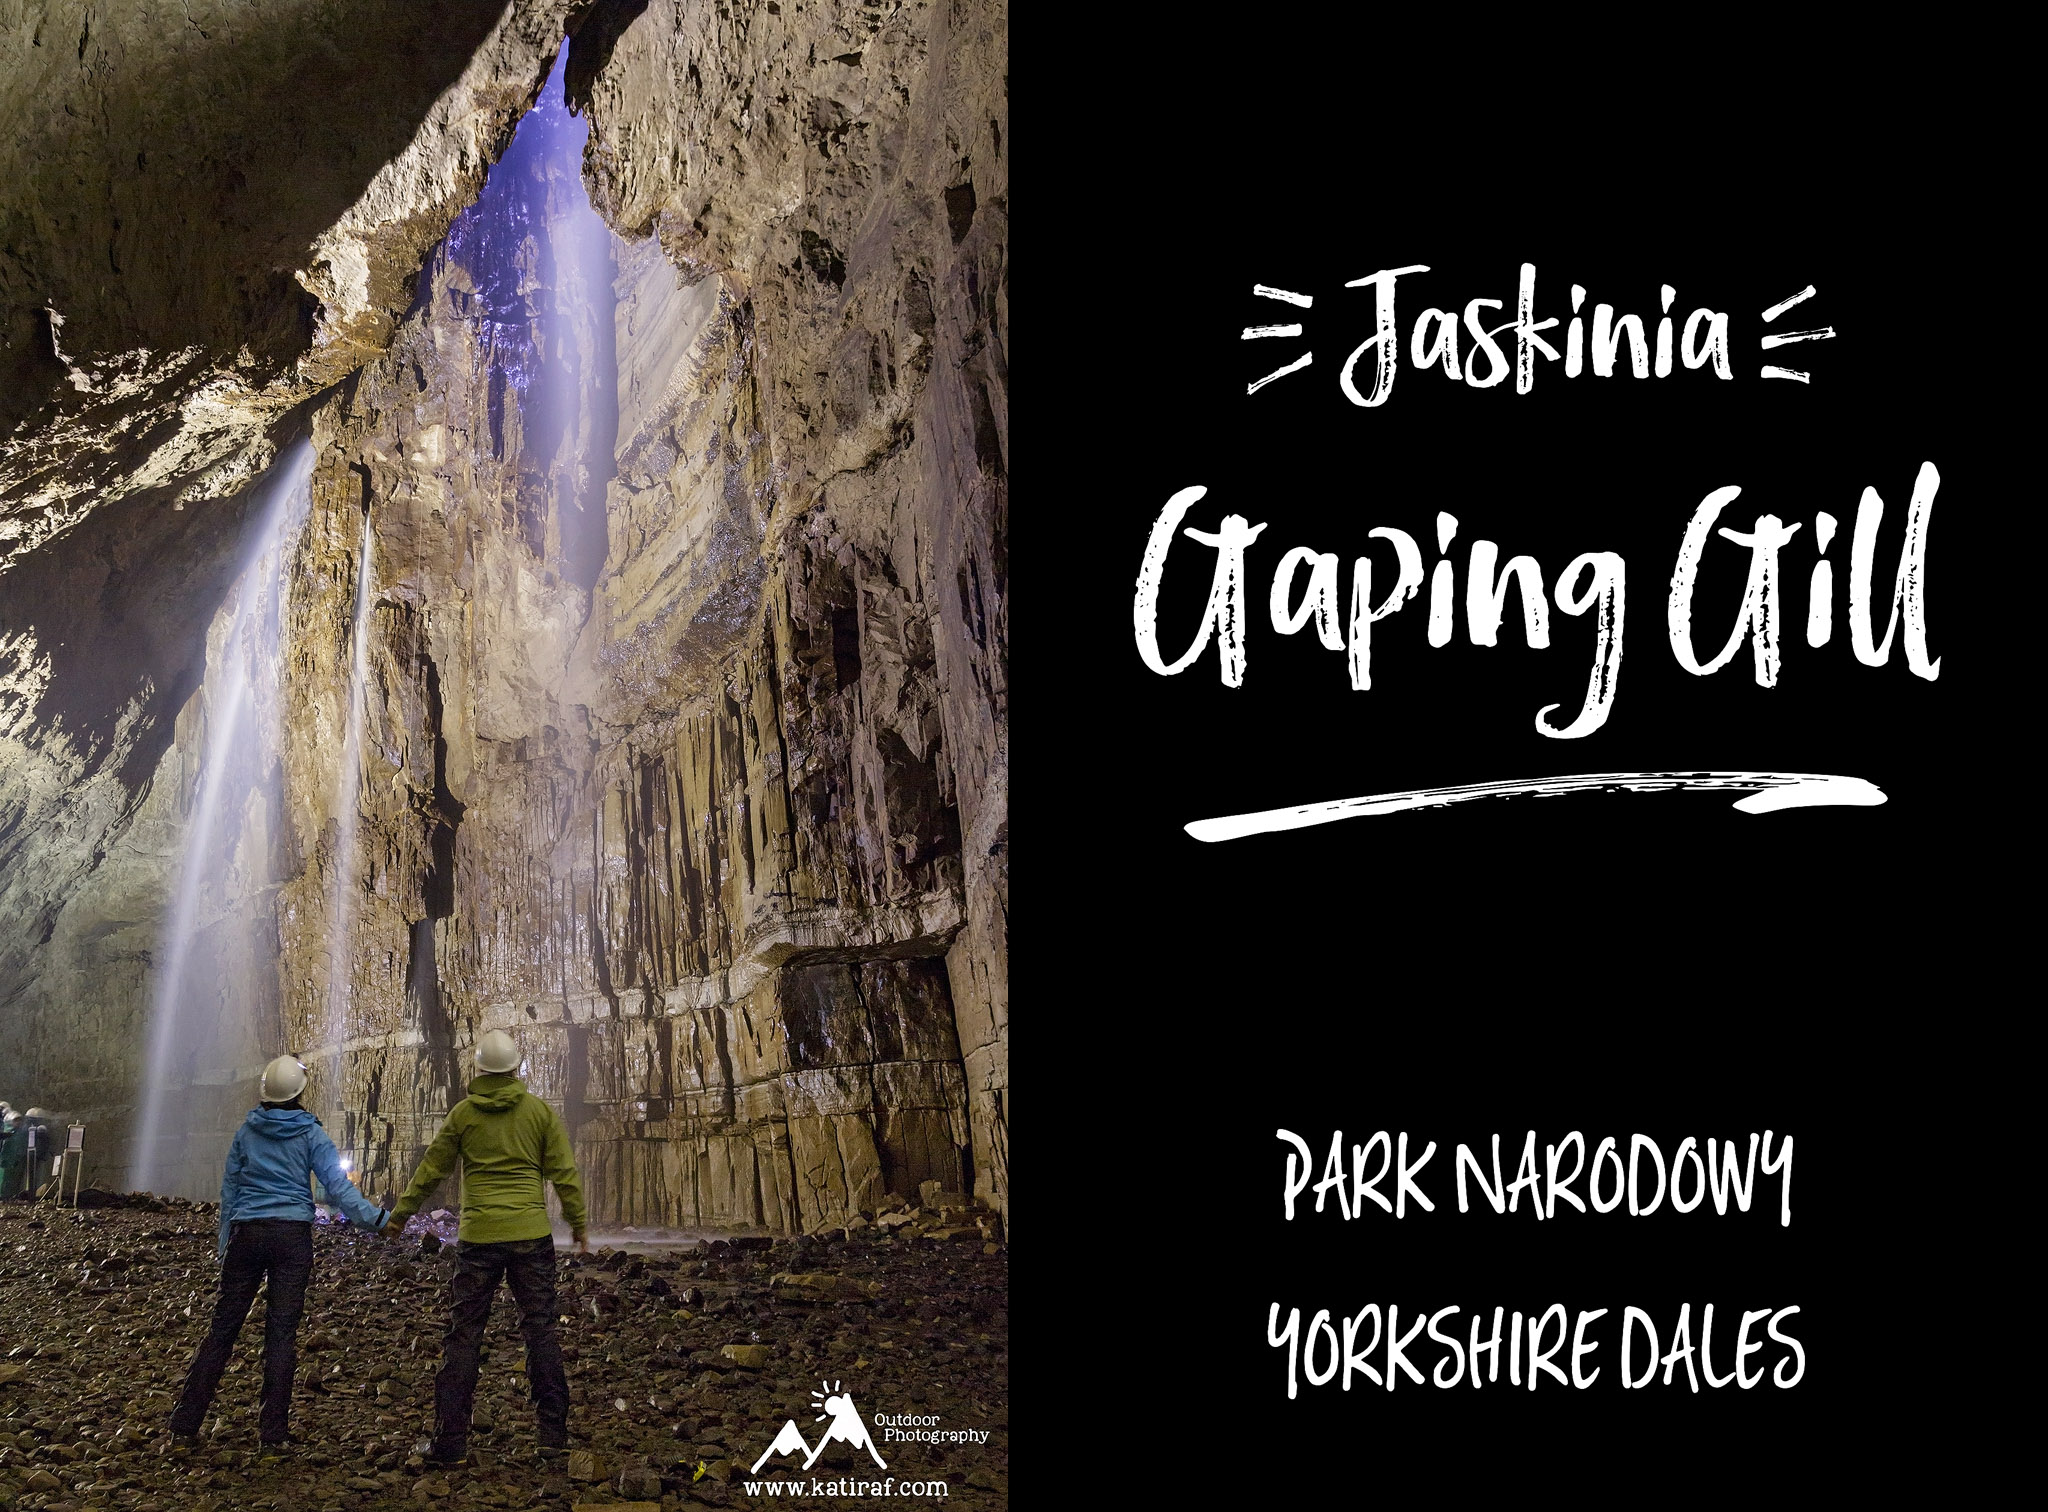 Jaskinia Gaping Gill, www.katiraf.com